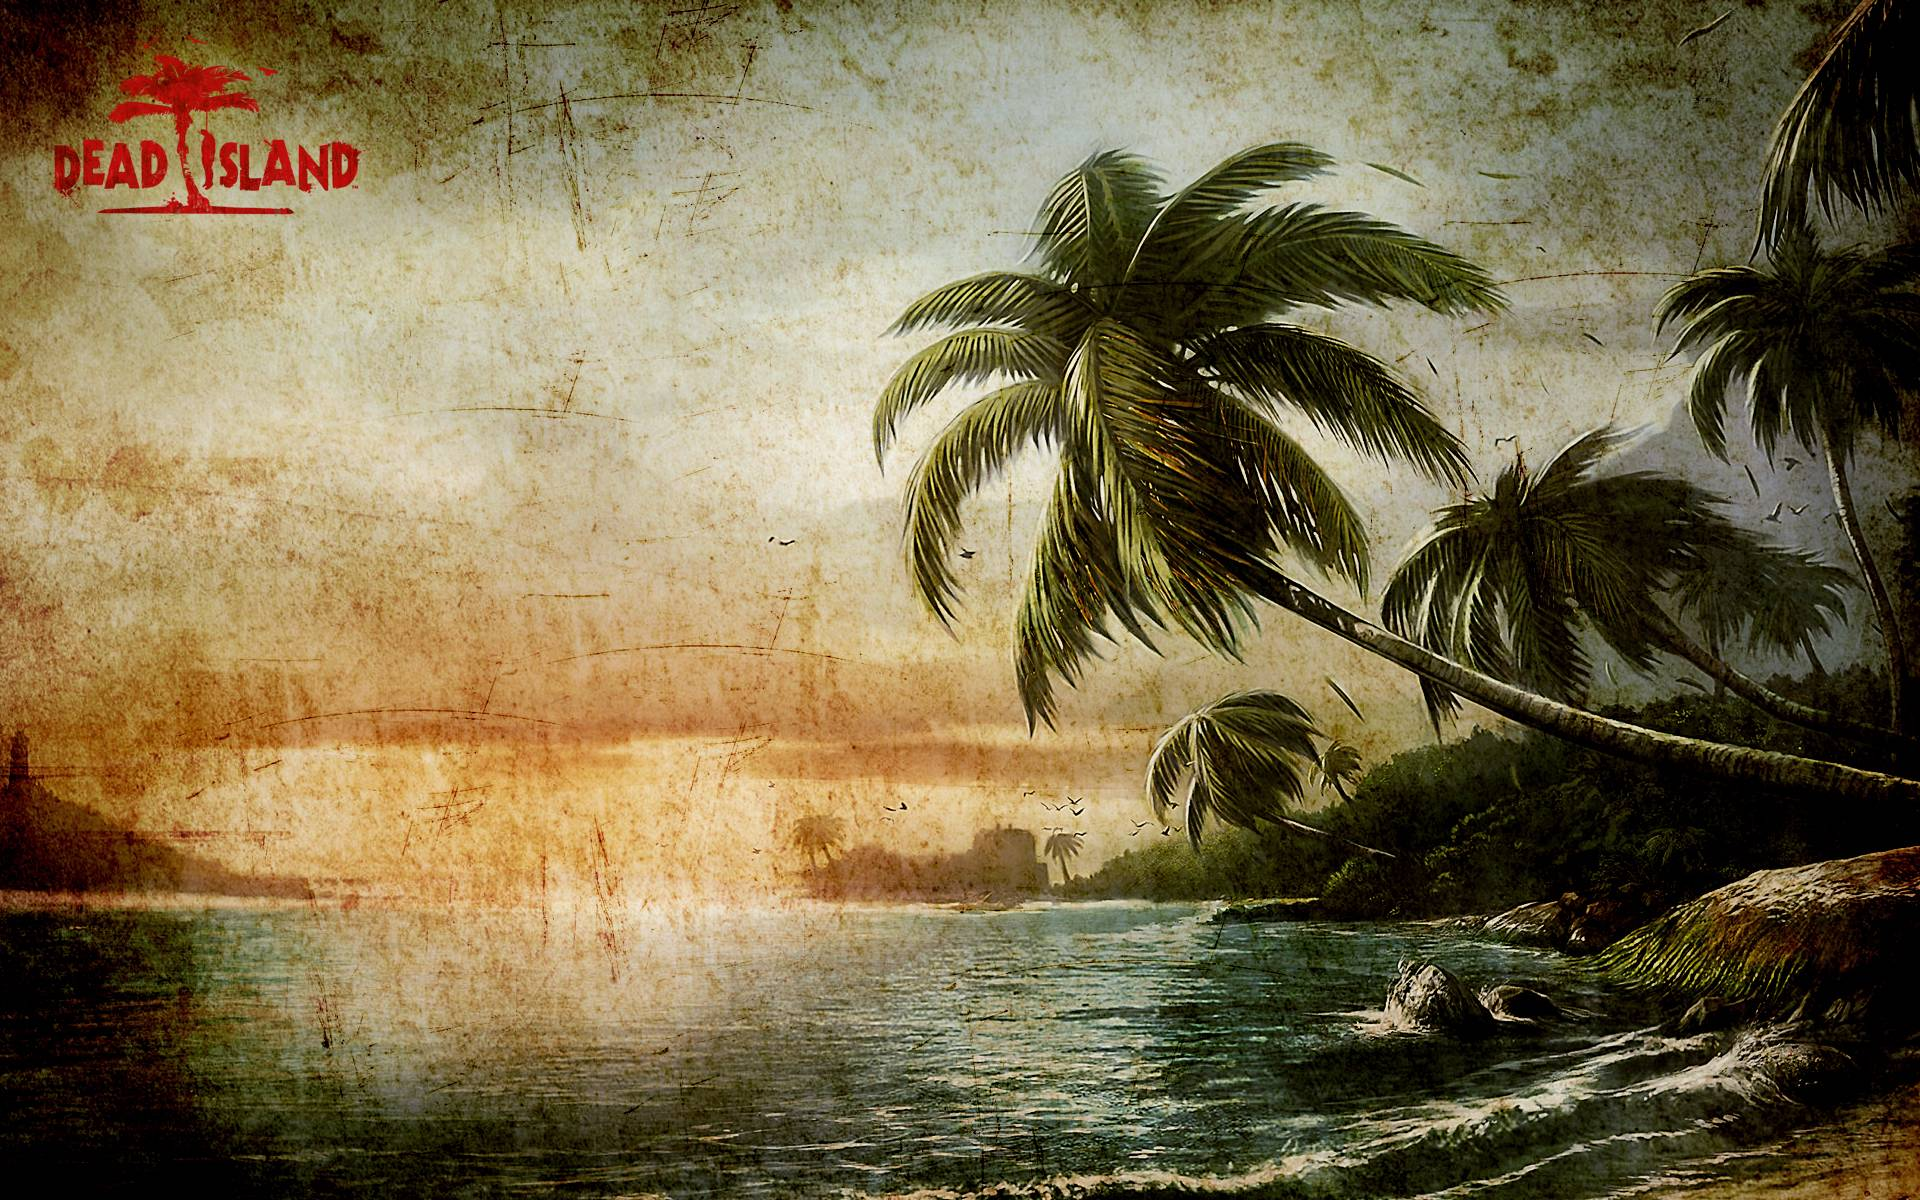 Dead Island Wallpapers - Wallpaper Cave